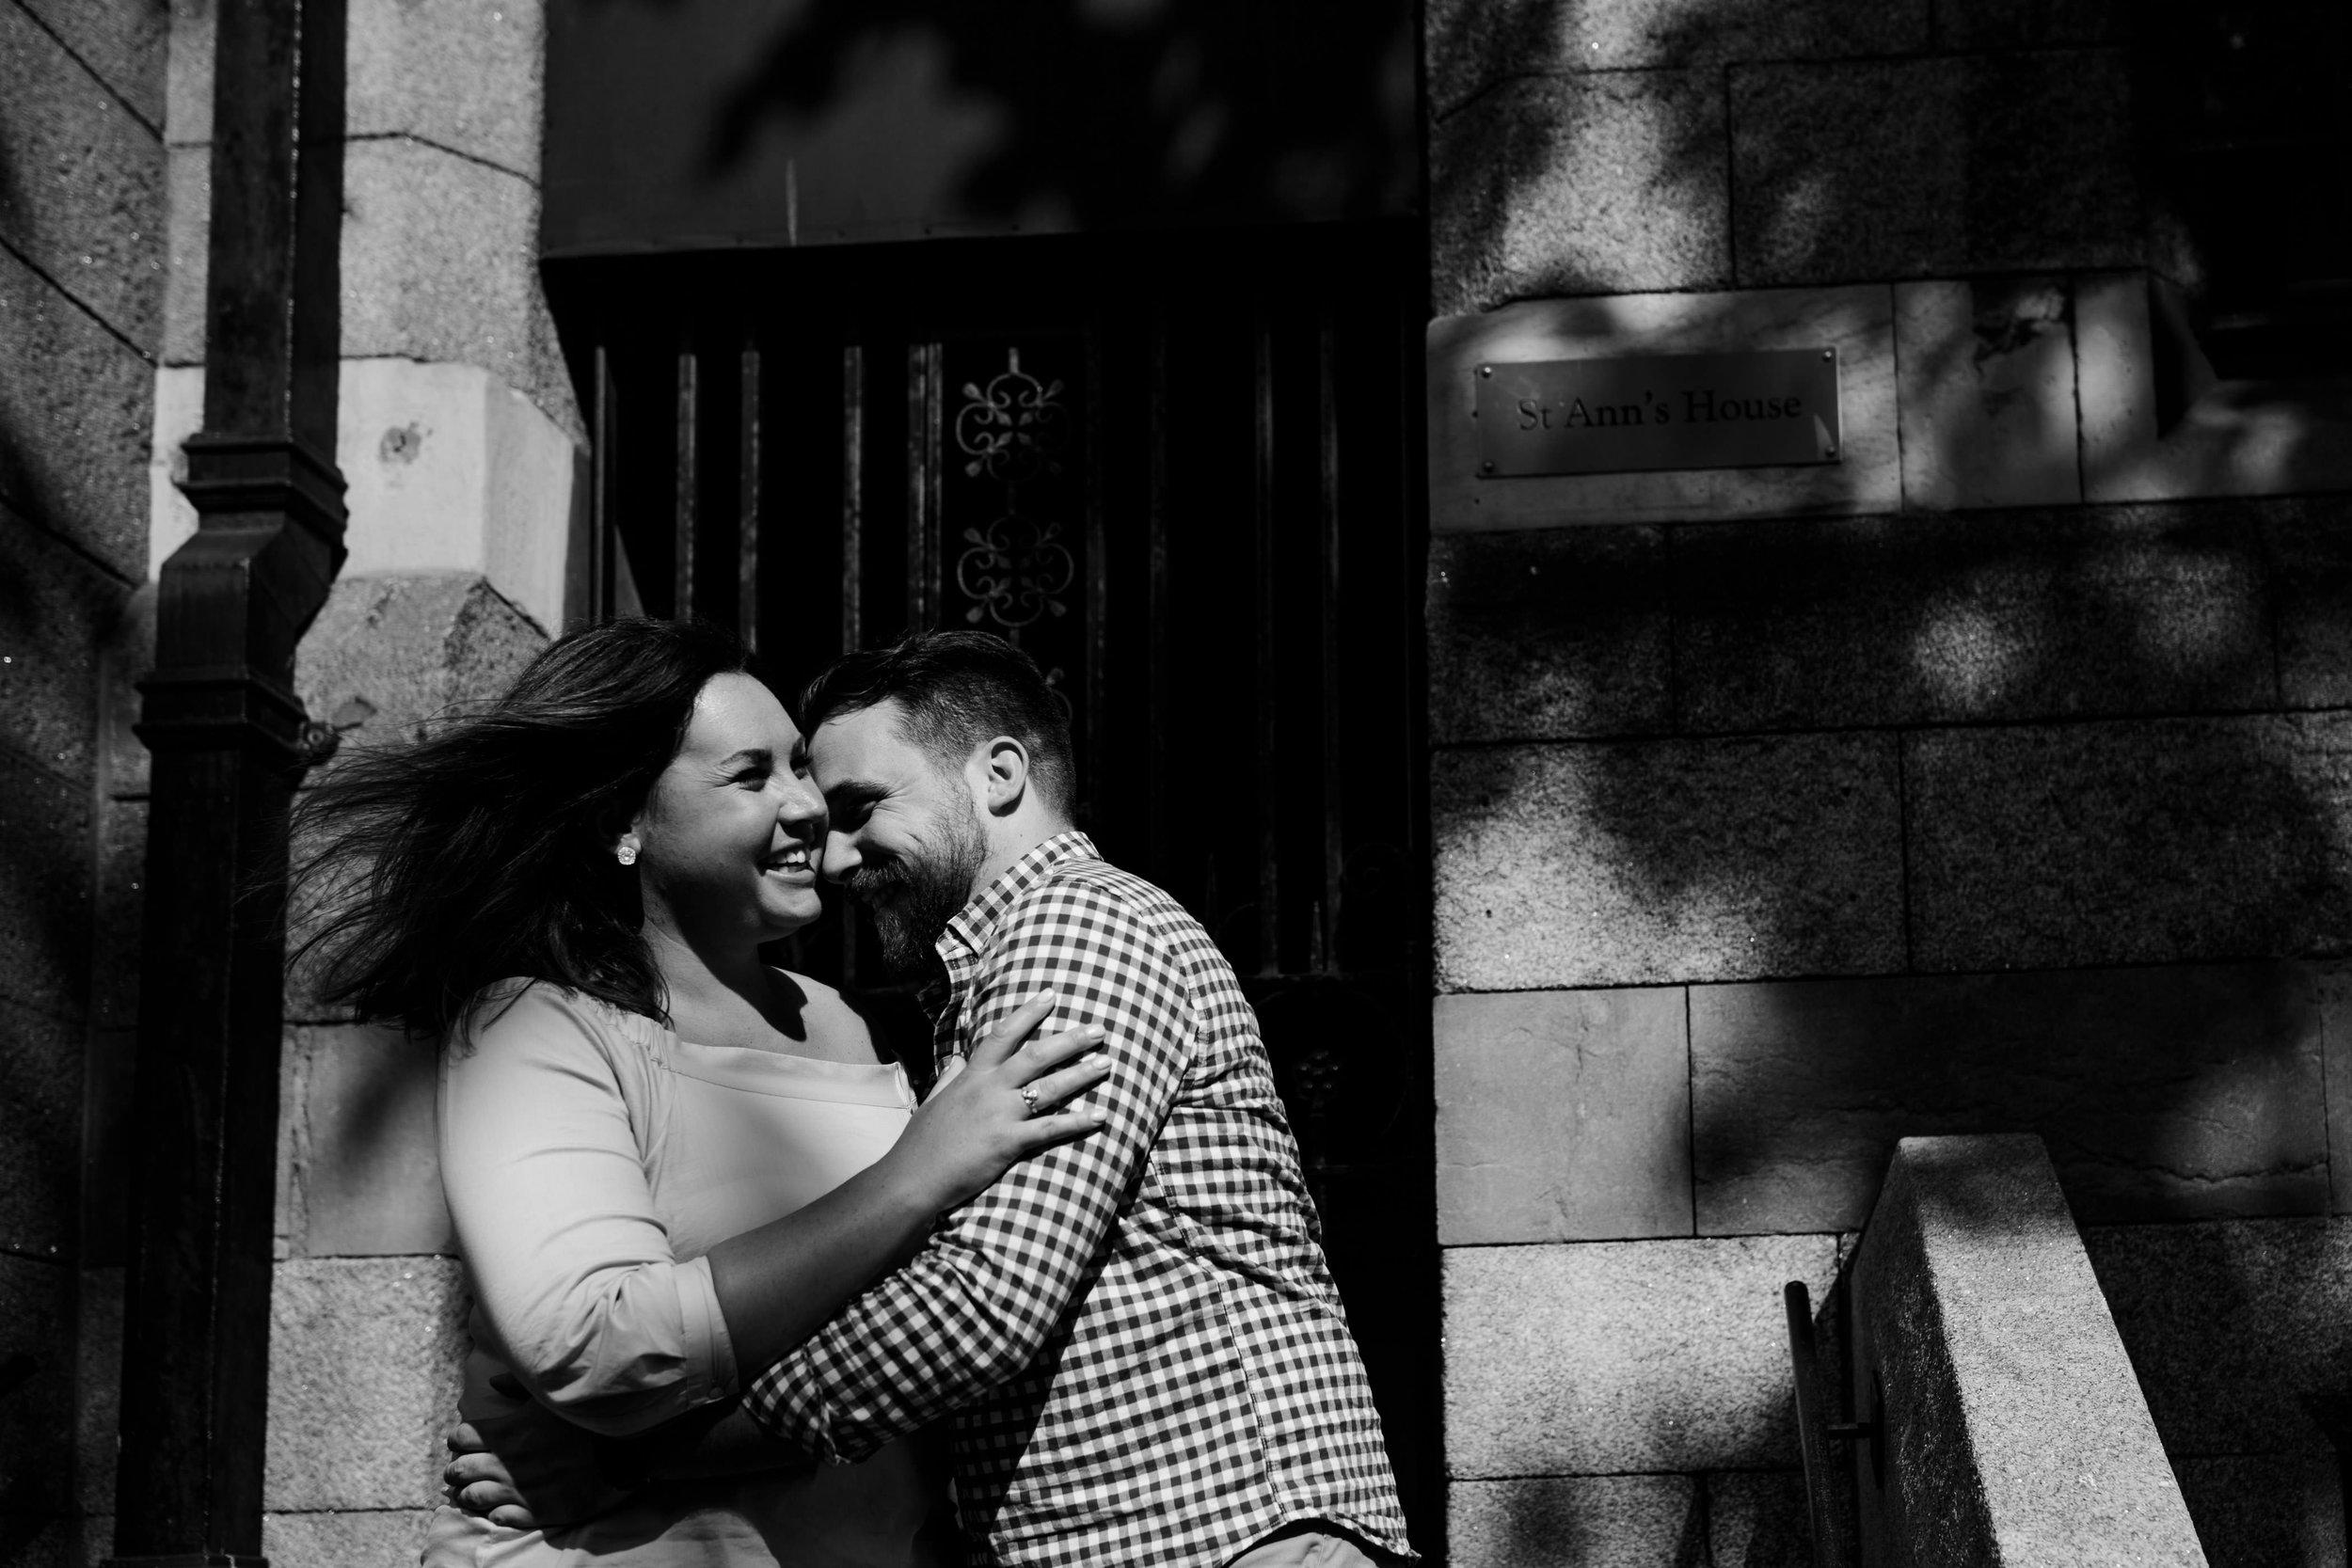 c&c_dublin_city_engagement_photos_livia_figueiredo_ireland_wedding_photographer_29.jpg